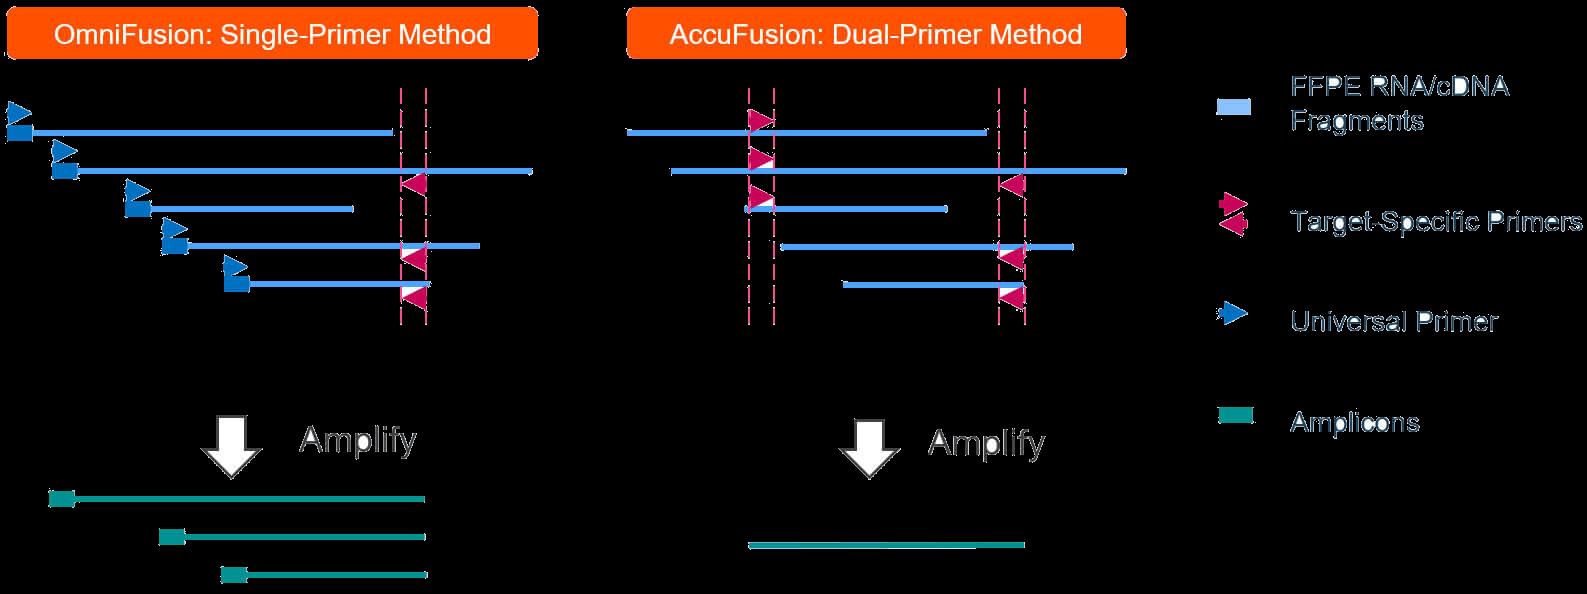 AccuFusion vs OmniFusion Targeted RNA fusion detection schematic comparison